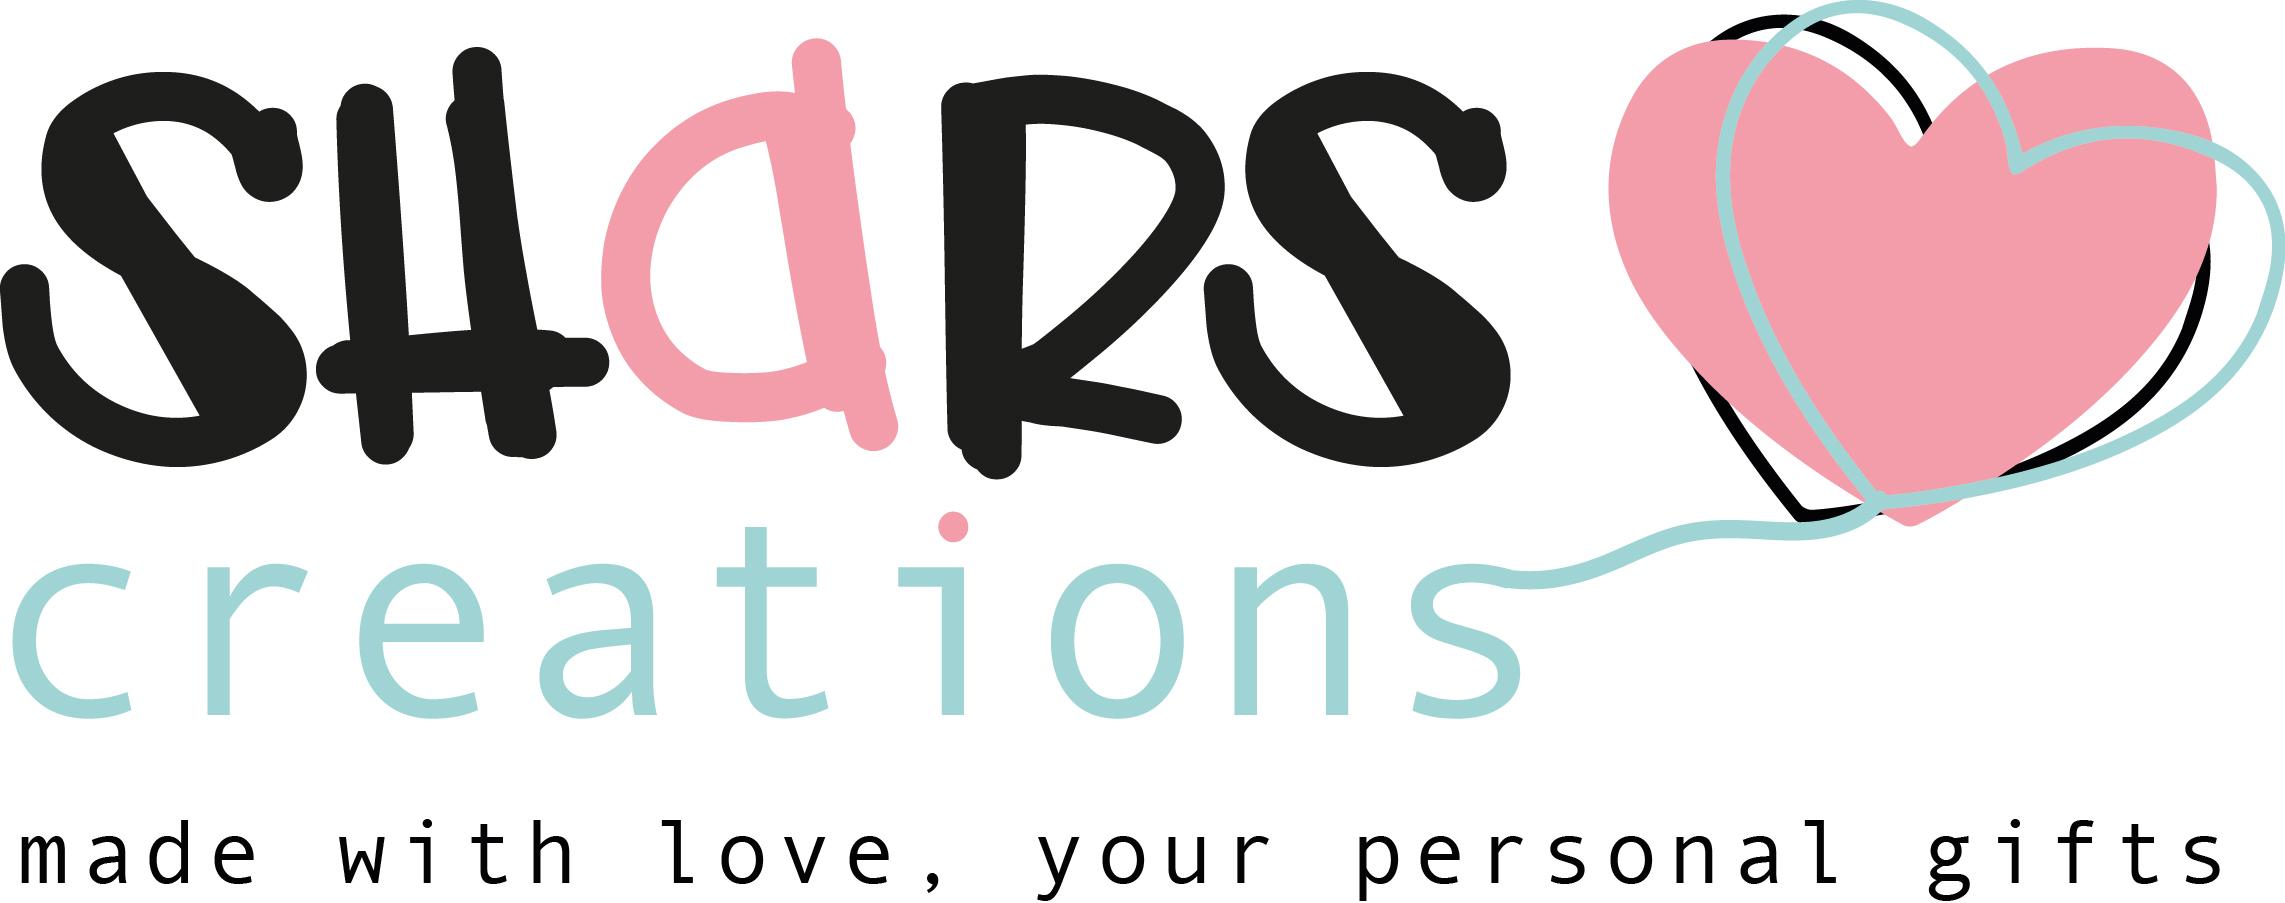 Shars Creations